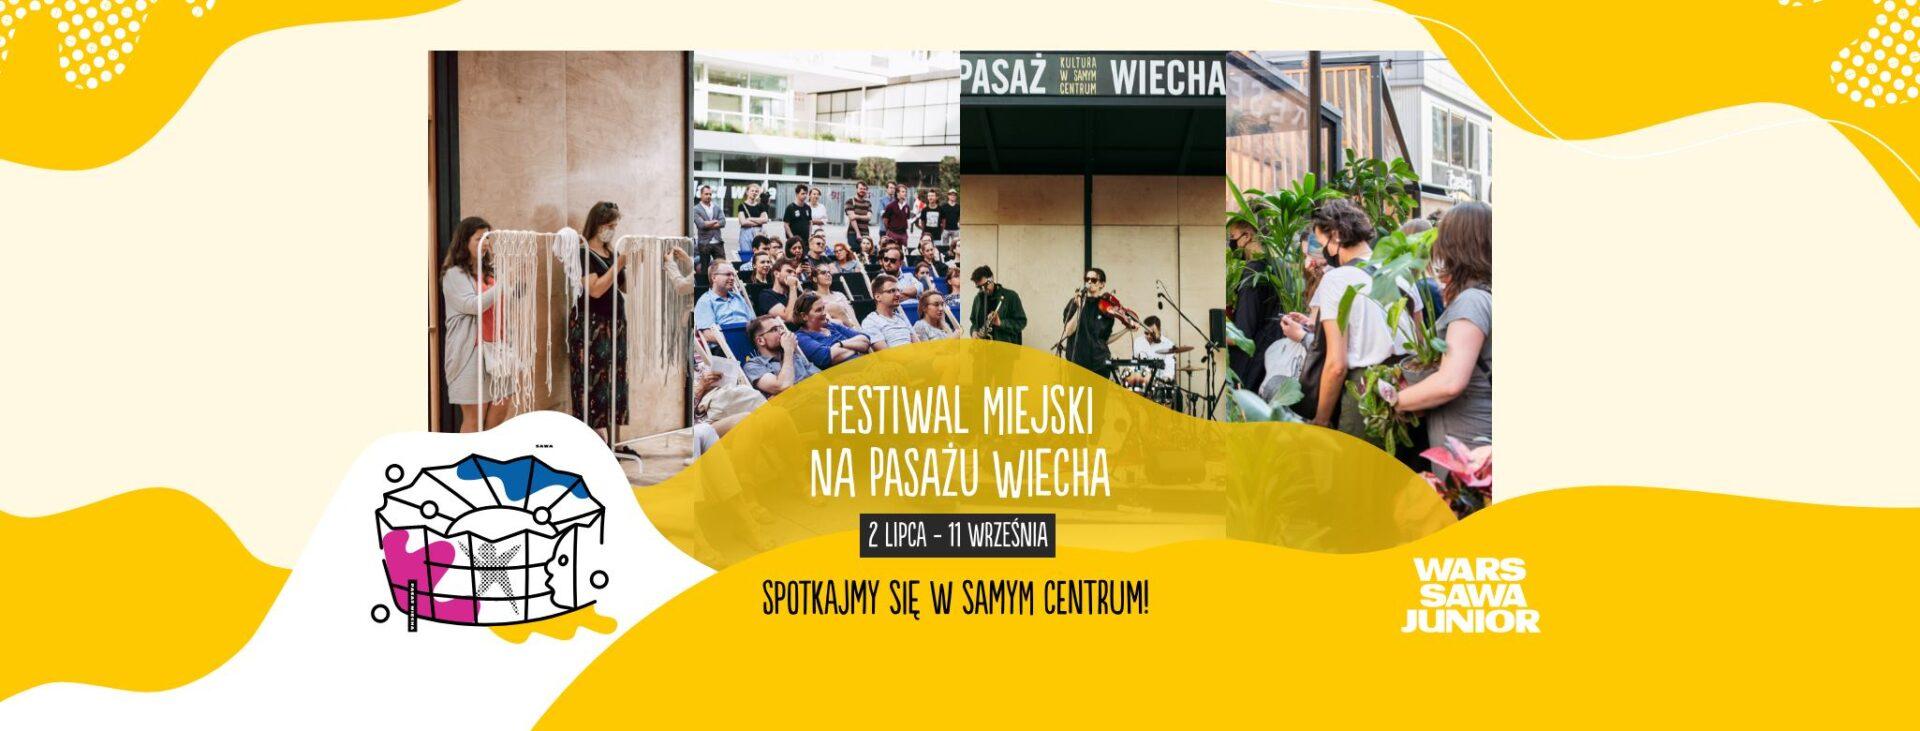 Festiwal Miejski na Pasażu Wiecha